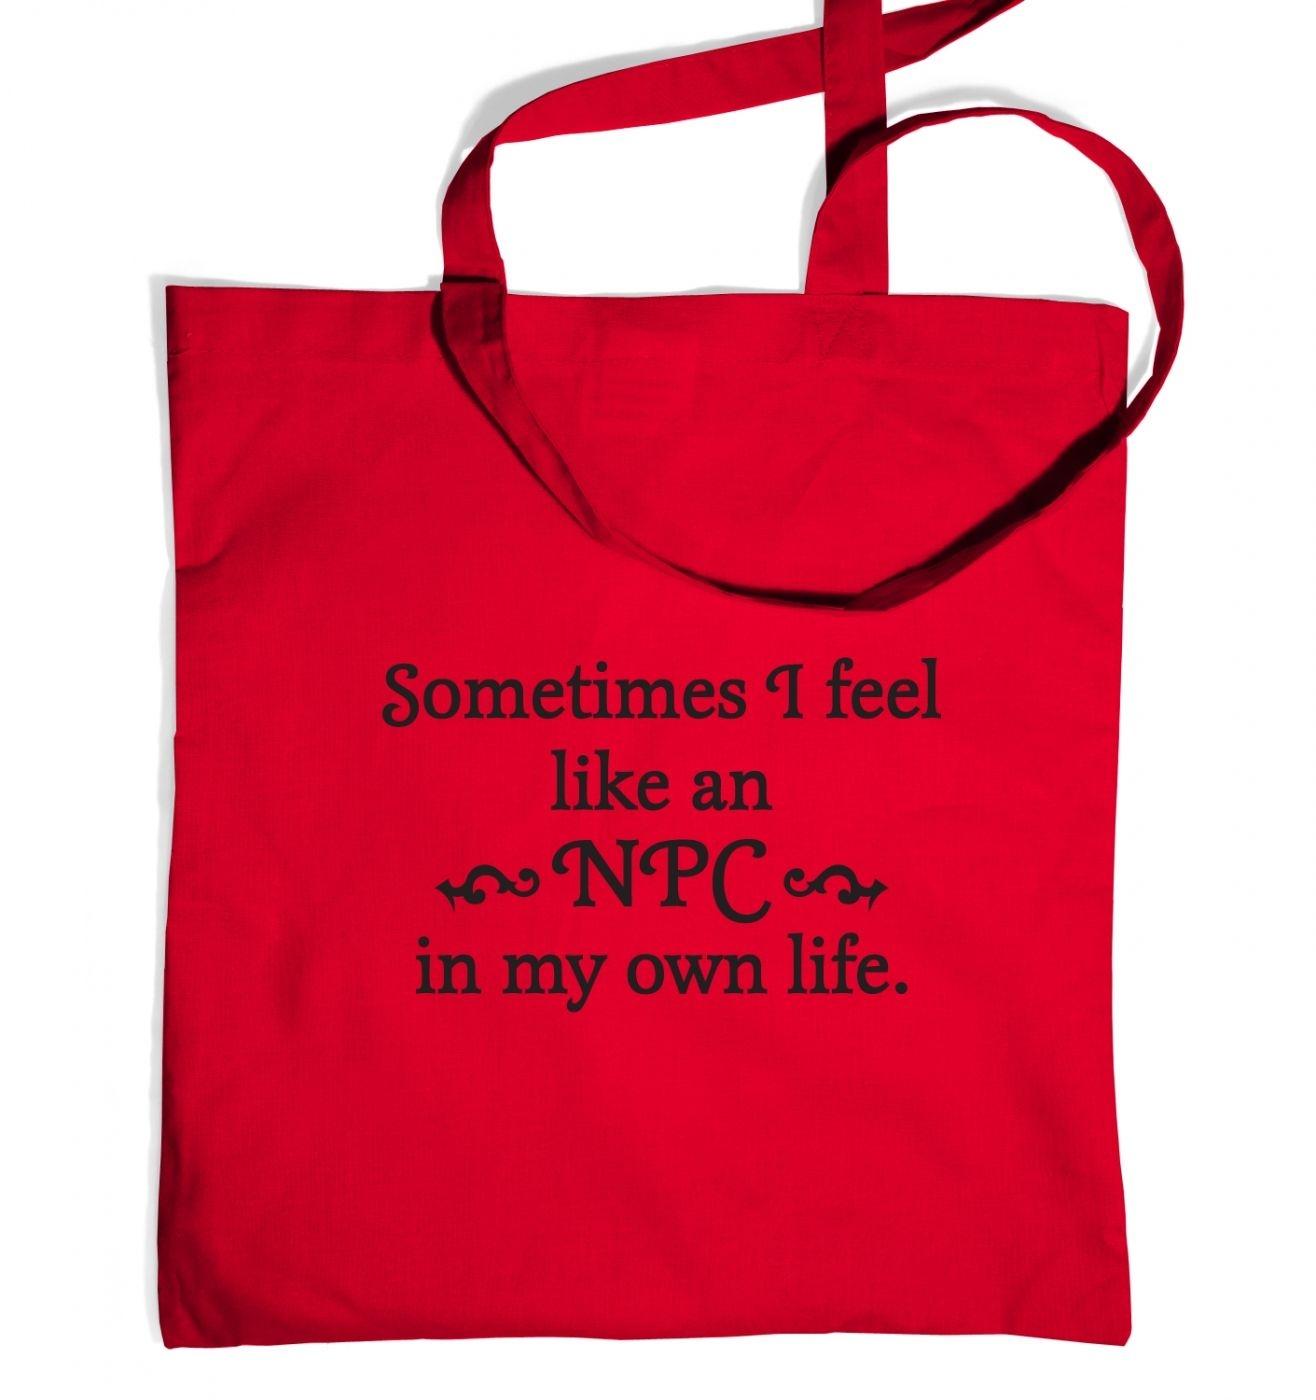 NPC in my own life tote bag